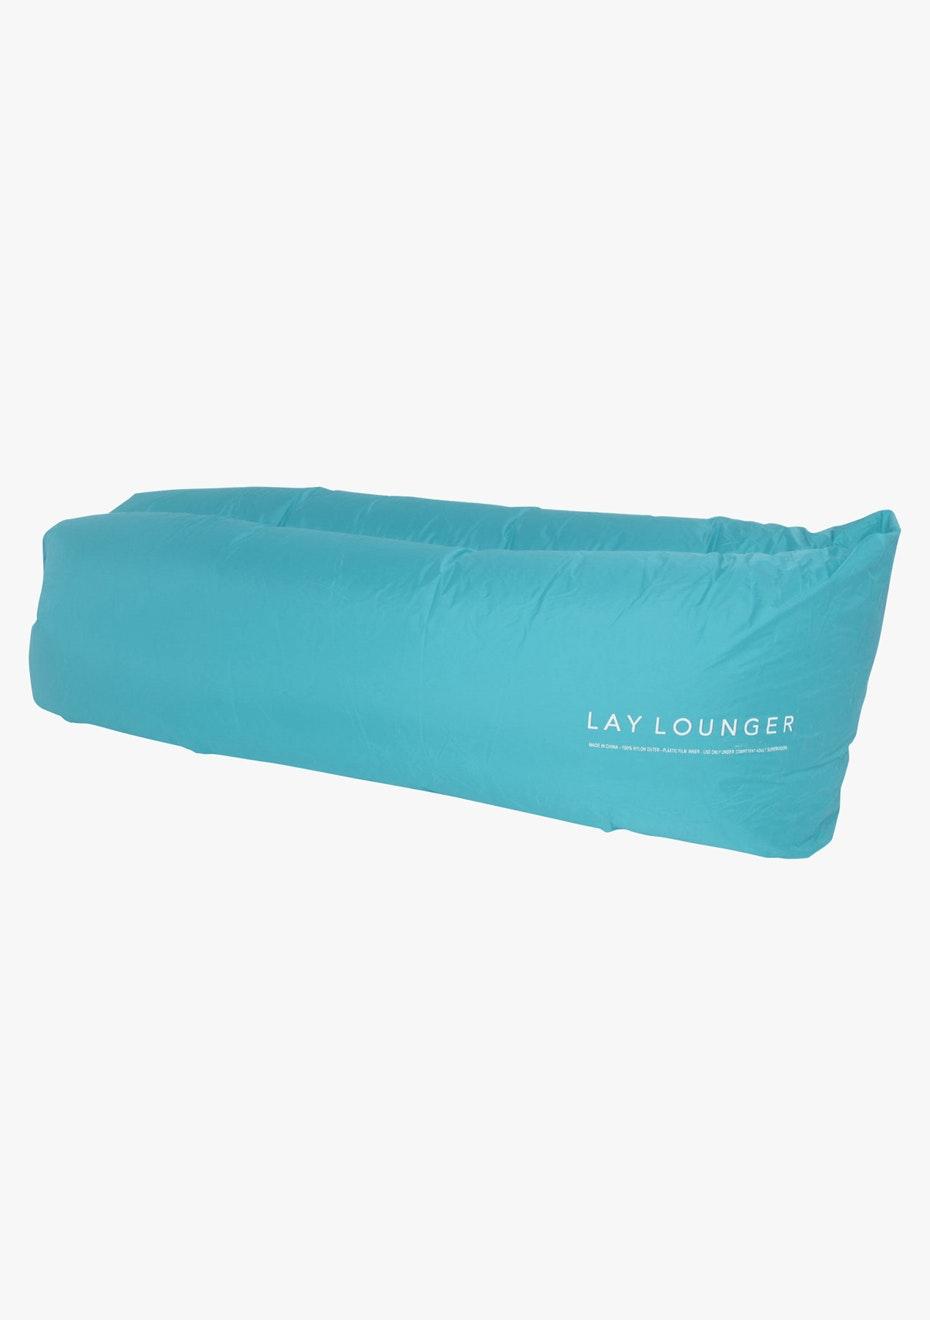 Lay Lounger Lounge Bag - Blue